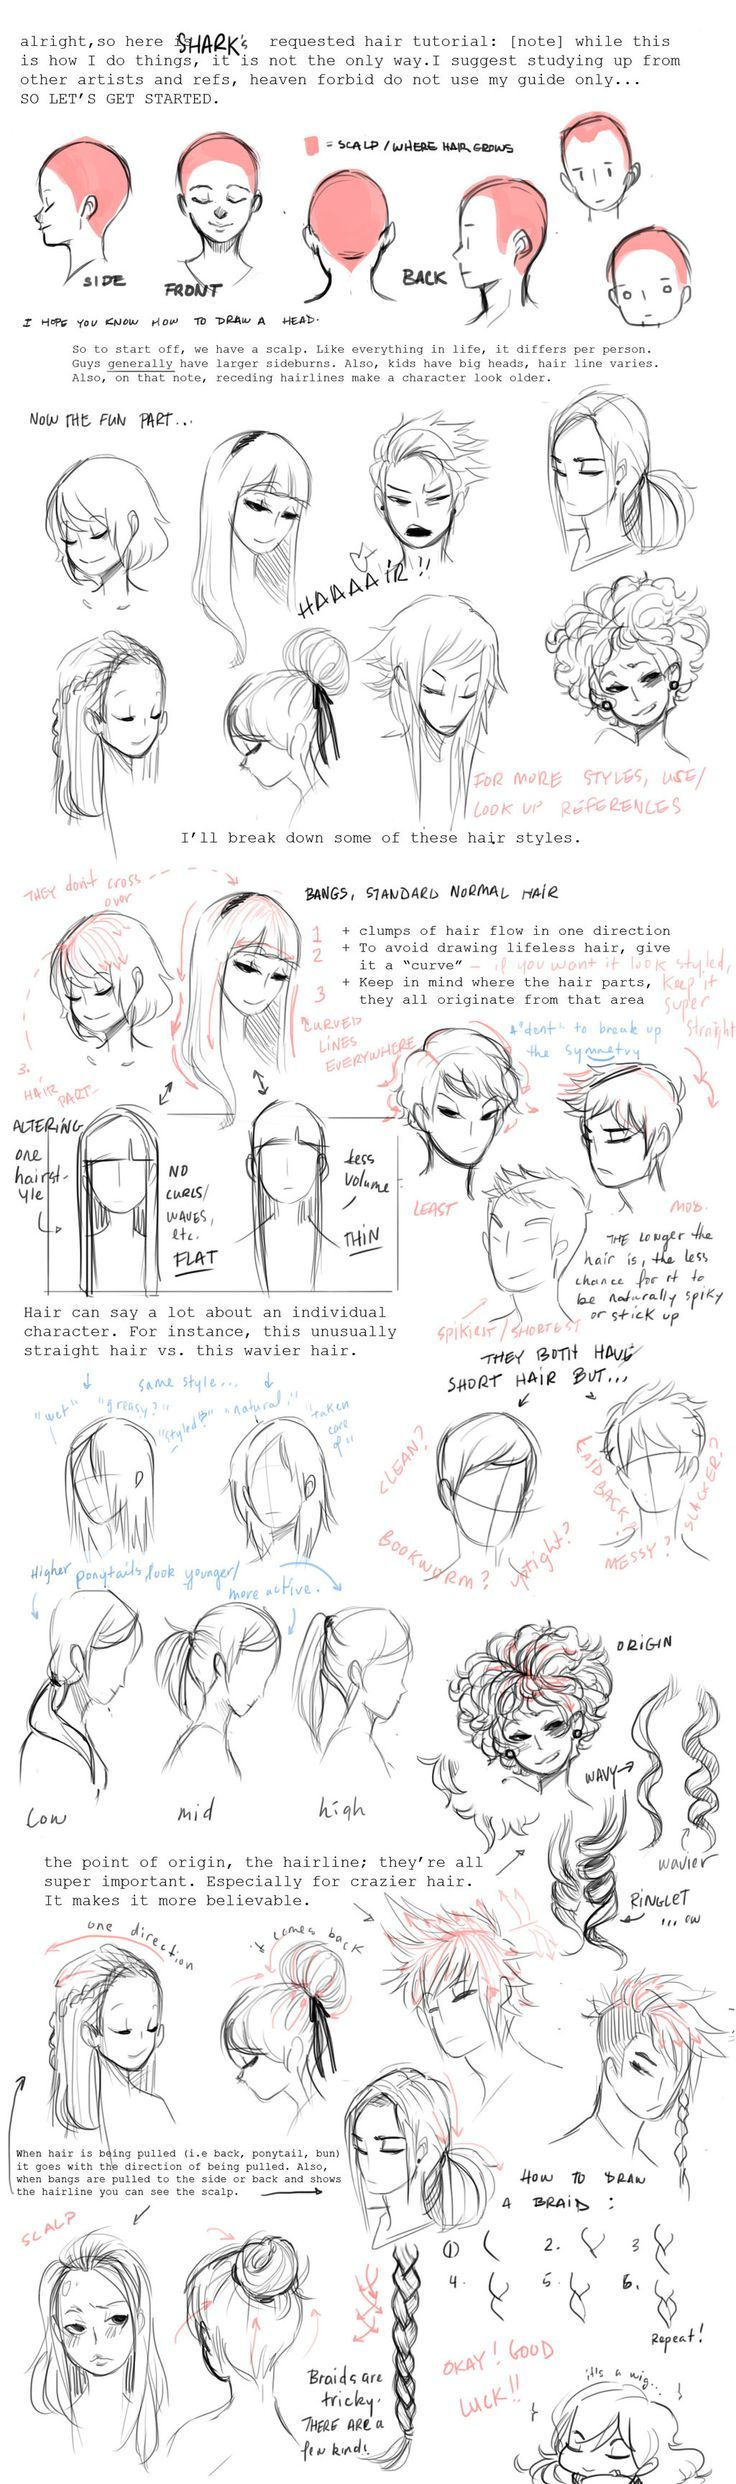 Hair Tutorial by shark-bomb on deviantART via PinCG.com: